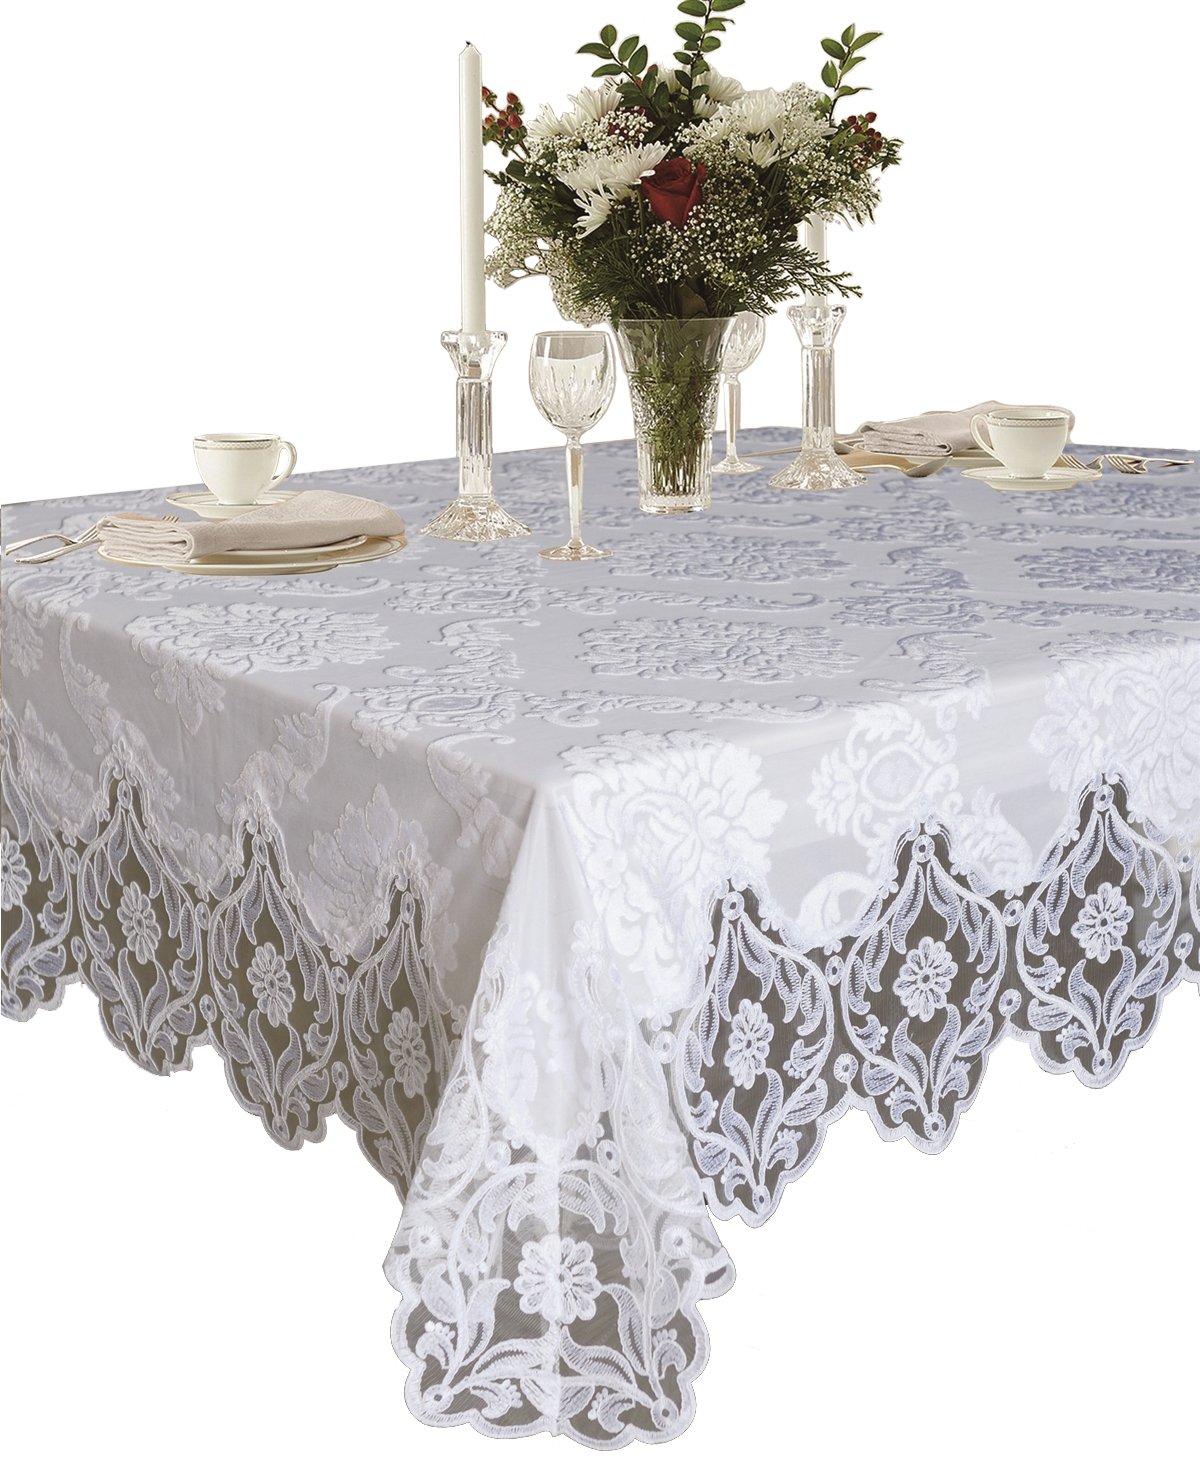 Violet Linen Elegant Velvet Lace Sheer Floral Deluxe Design Tablecloths, 70'' x 144'', White